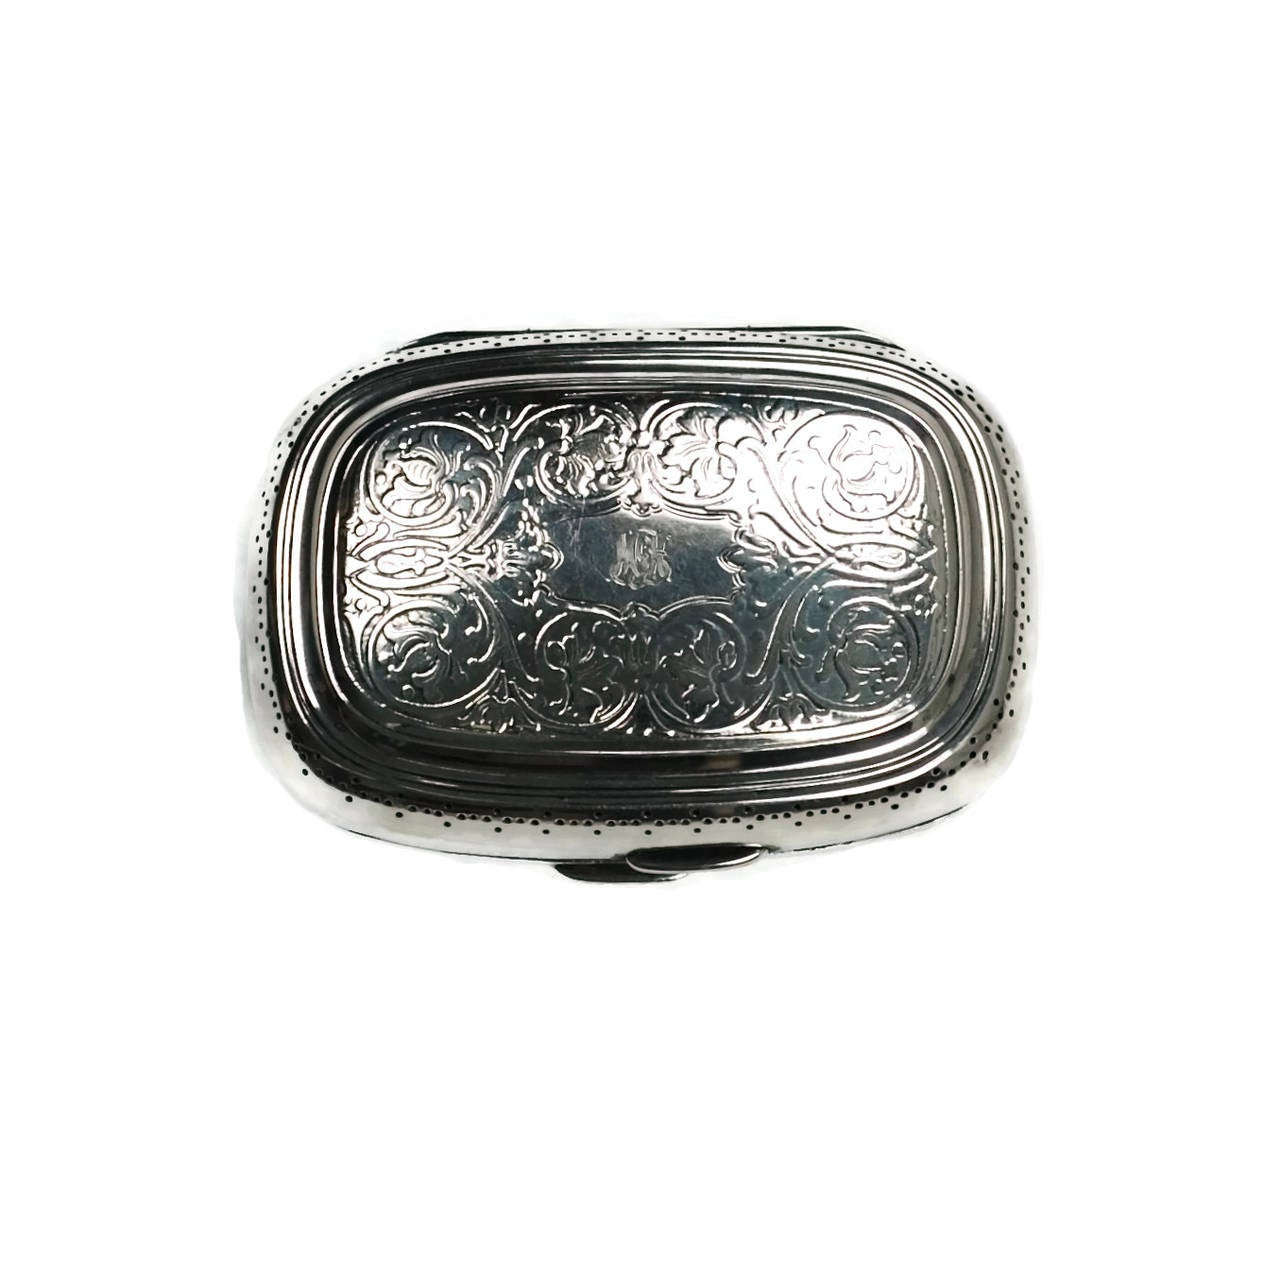 Edwardian Tiffany & Co. Sterling Silver 13-Piece Vanity Set For Sale 1